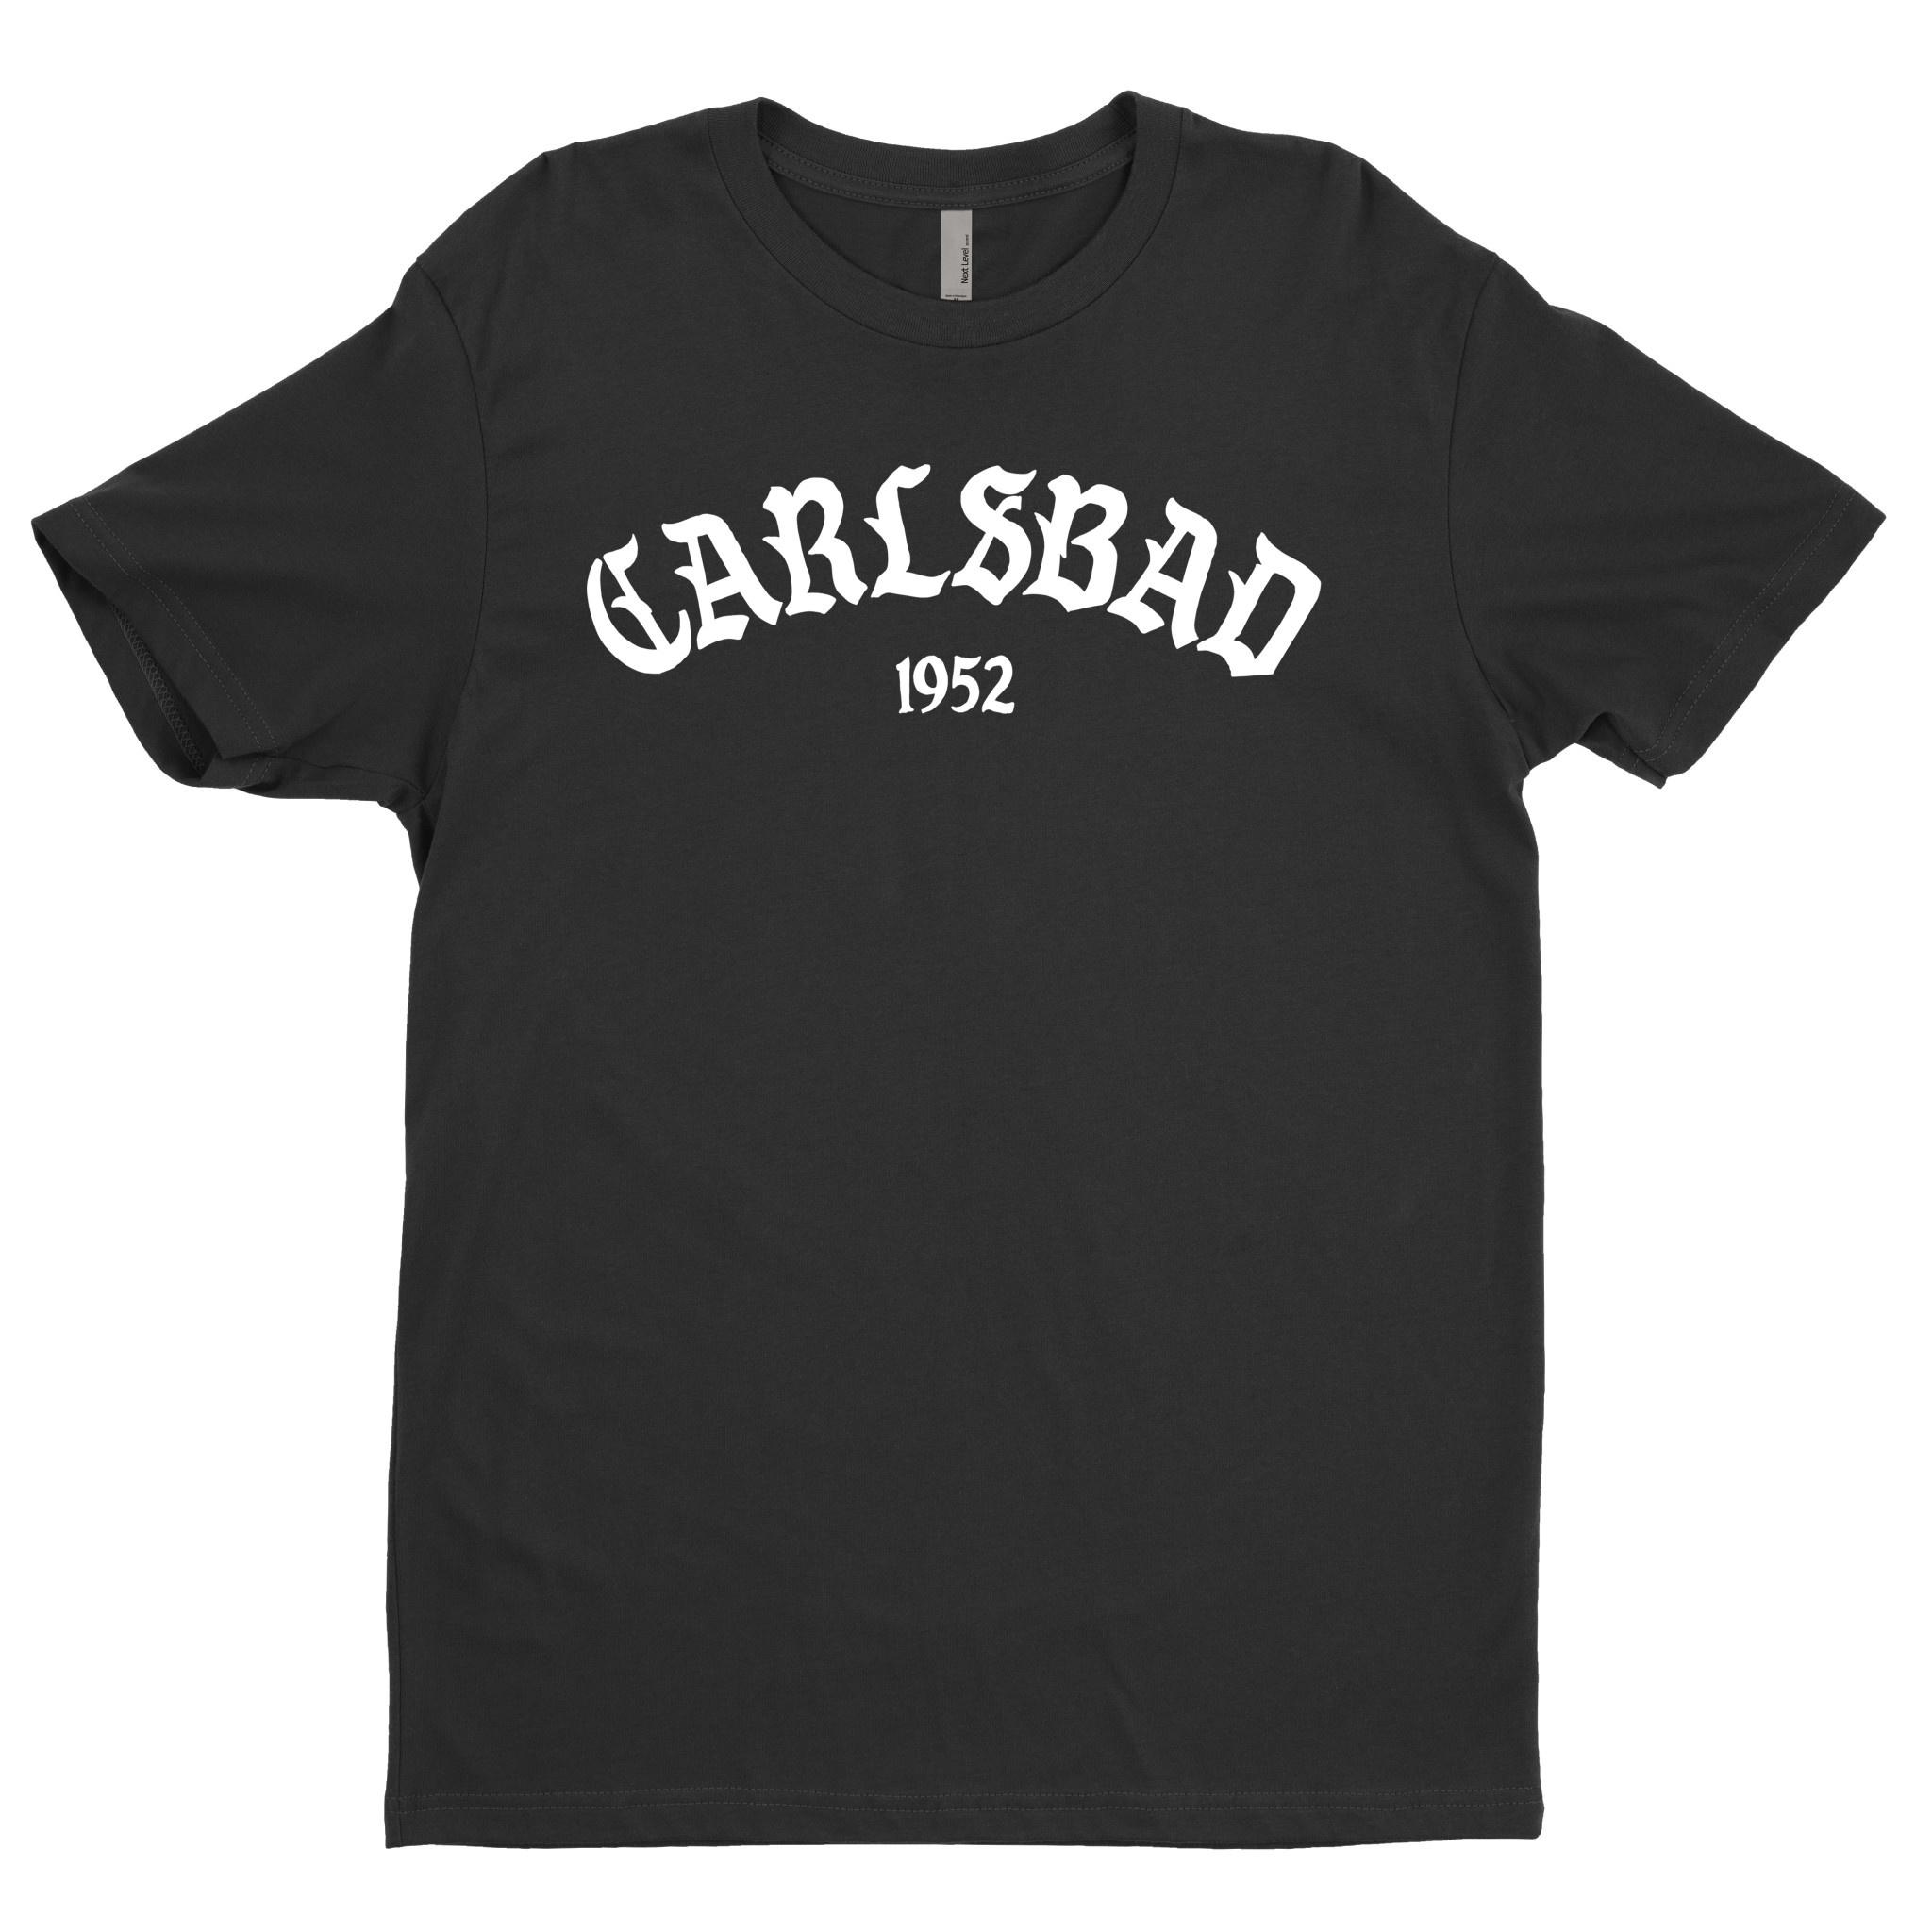 Old English BTC, Carlsbad Tees